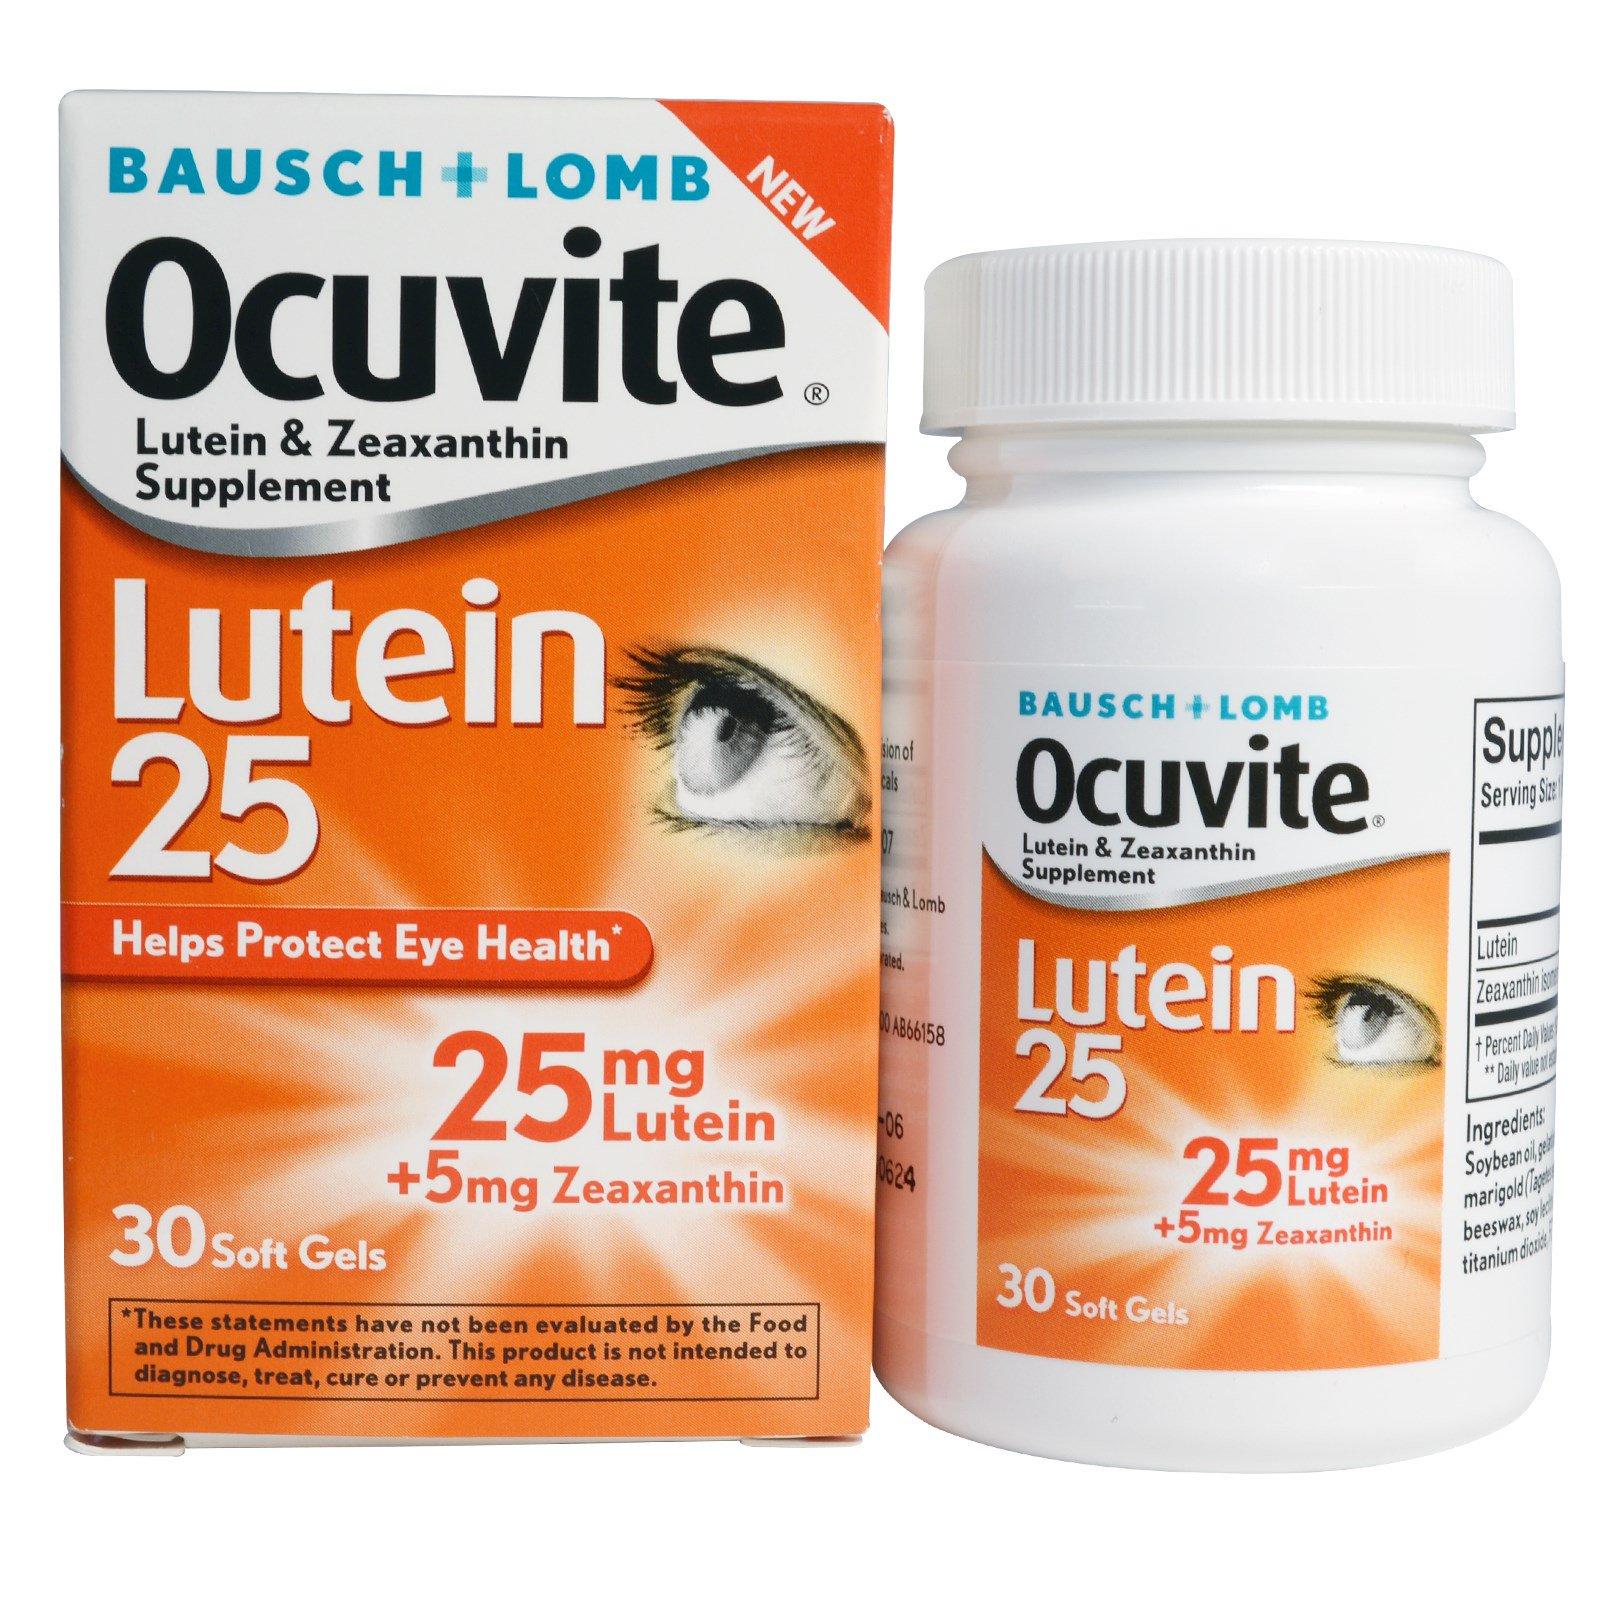 Bausch & Lomb Ocuvite, Лютеин 25, 30 мягких желатиновых капсул